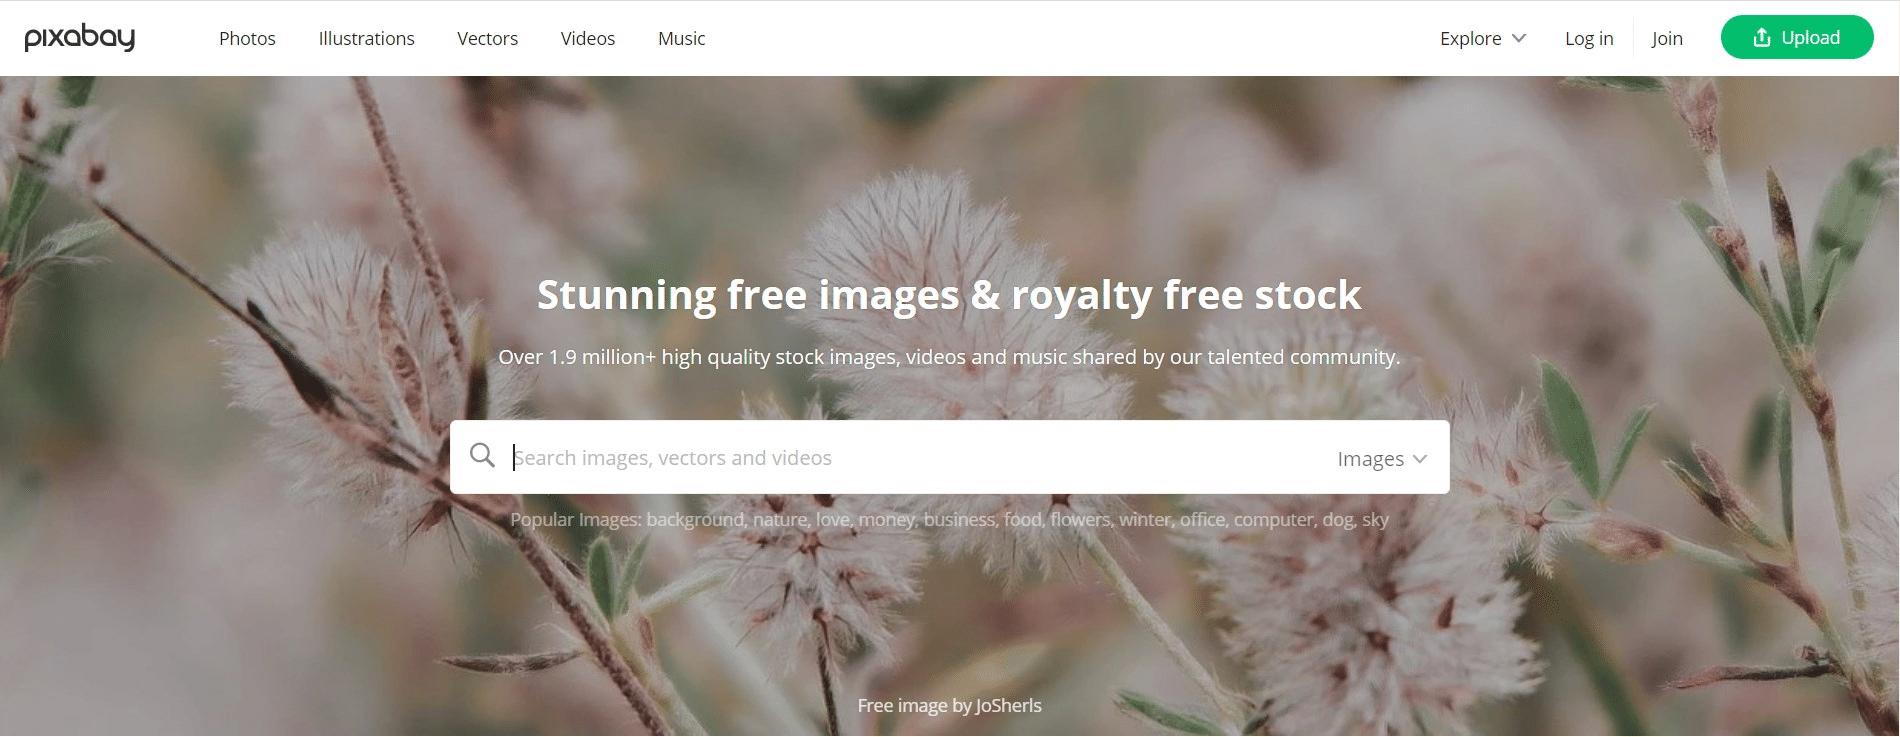 Pixabay-free stock images website -bigwigblogger